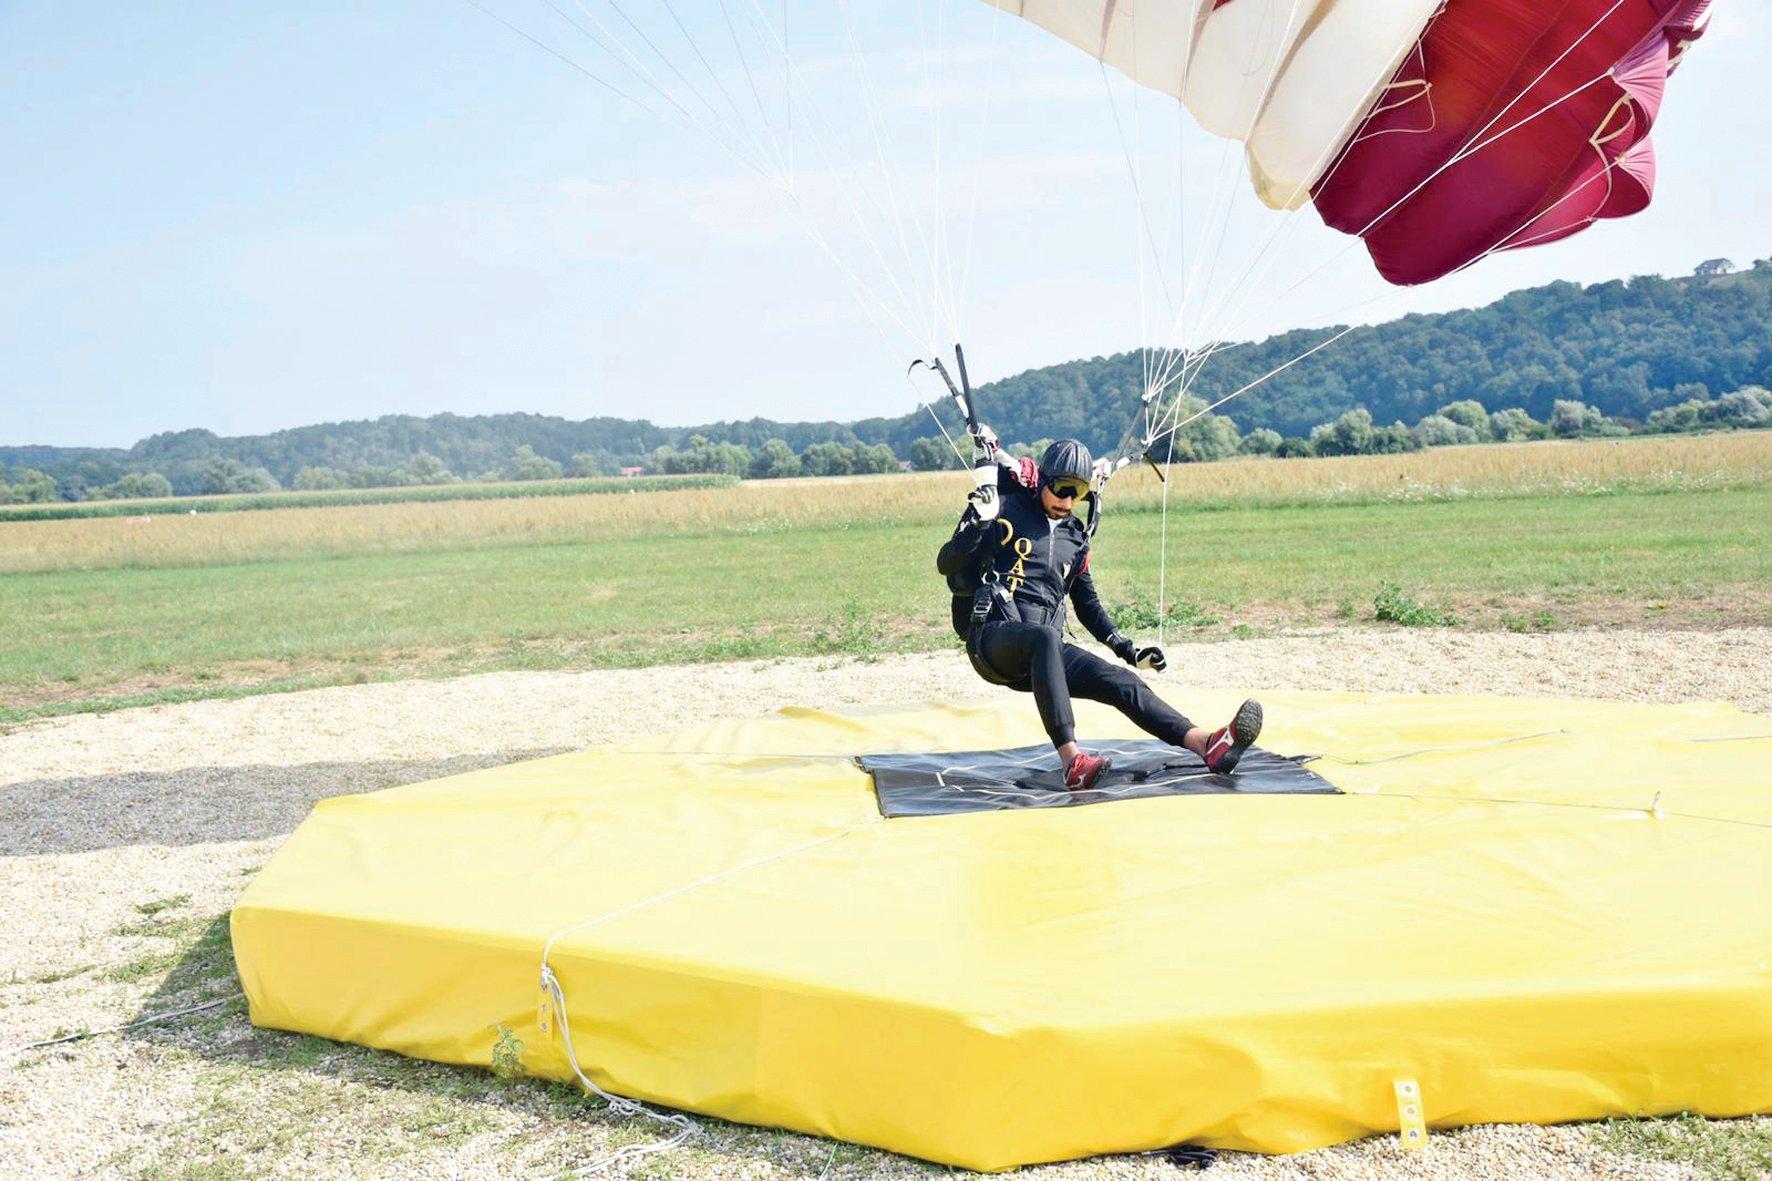 Qatar Parachute Jumping Team Win First Place in Slovenia Championship